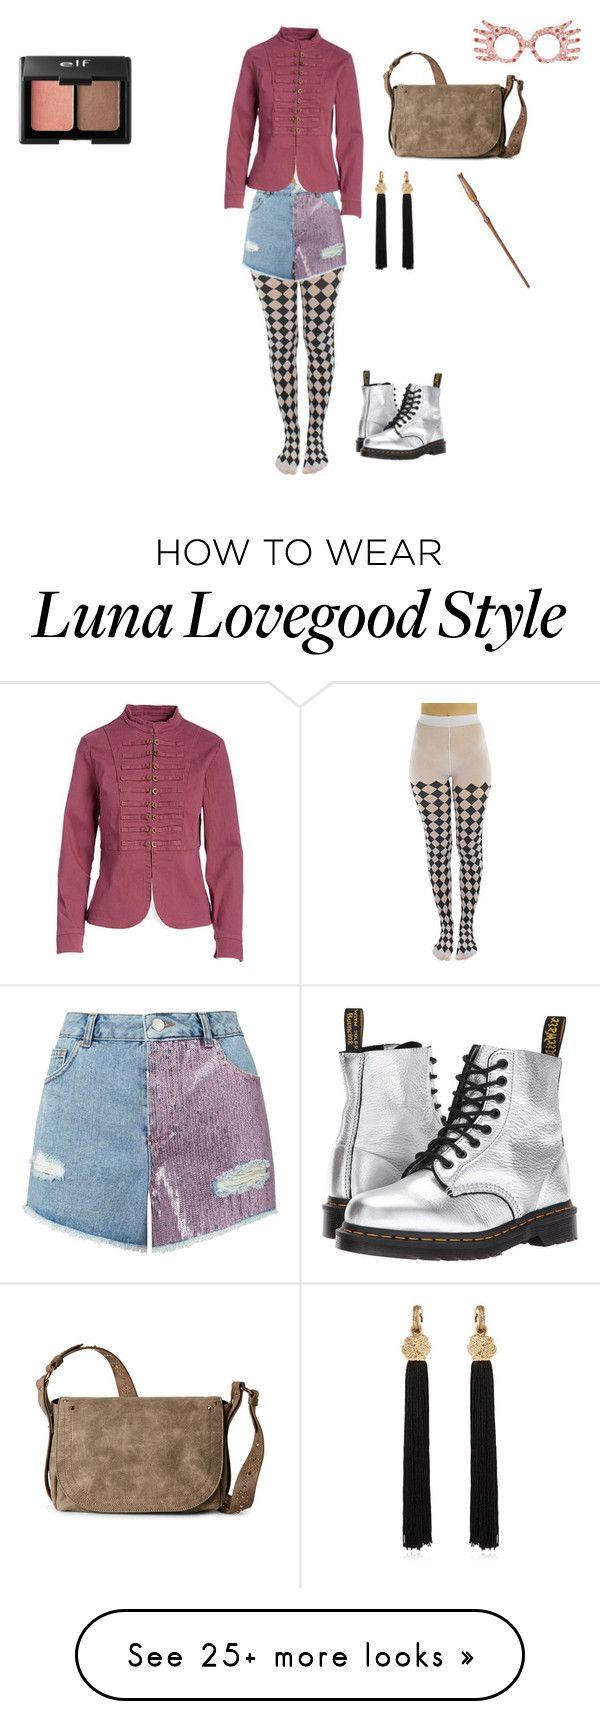 """Luna Lovegood"" by emme23412 on Polyvore featuring Miss Selfridge, Dr. Martens, Live a Little, Steve Madden, Yves Saint Laurent and Charlotte Russe"